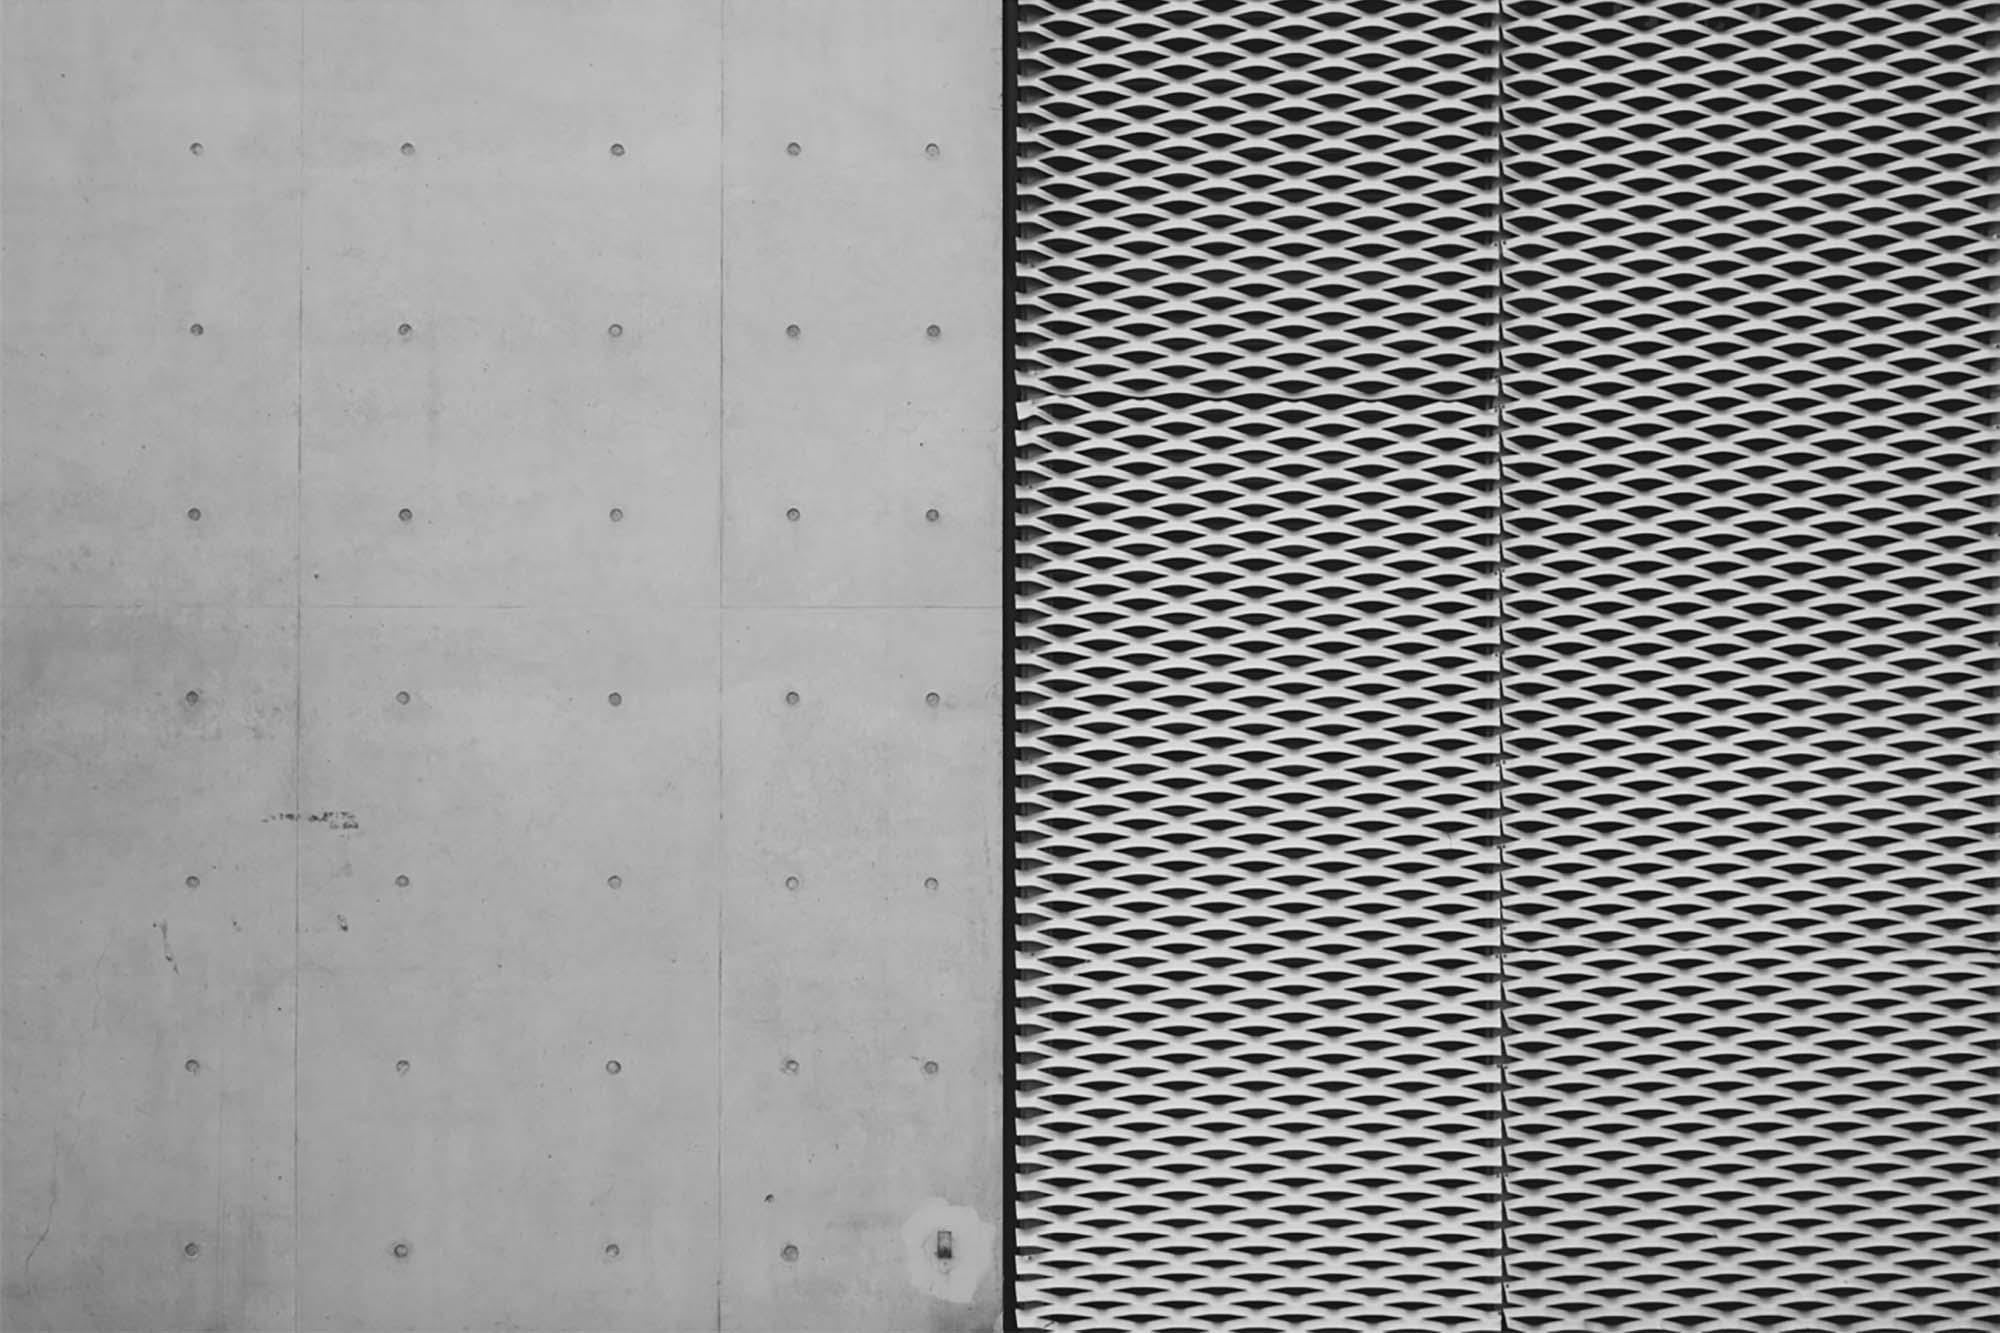 Wayfinding Wall Mockup 2